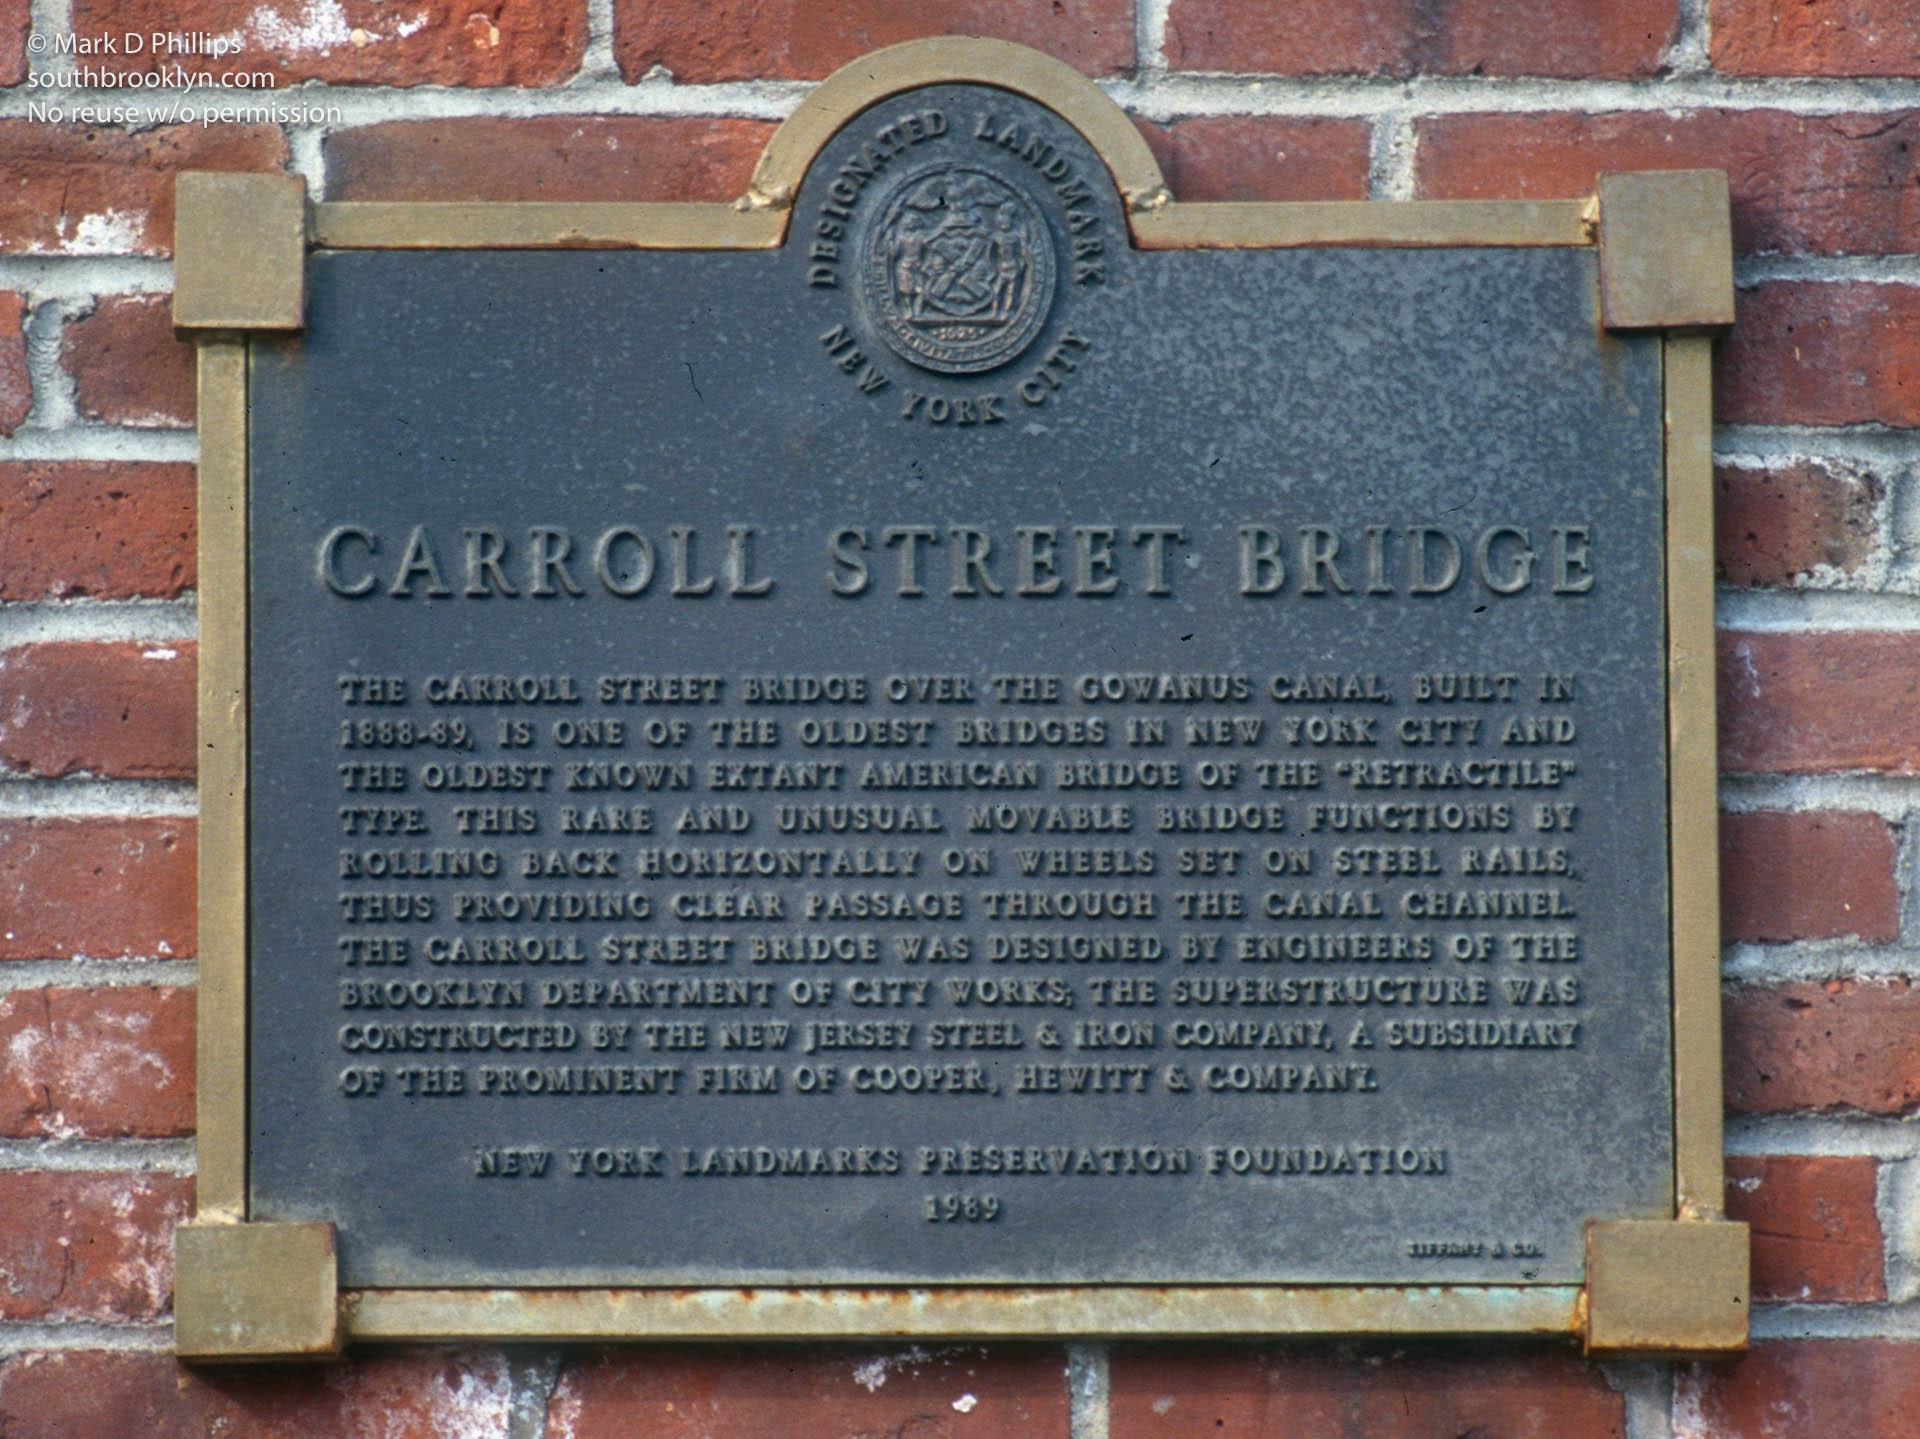 Carroll Street Bridge over the Gowanus Canal historical marker